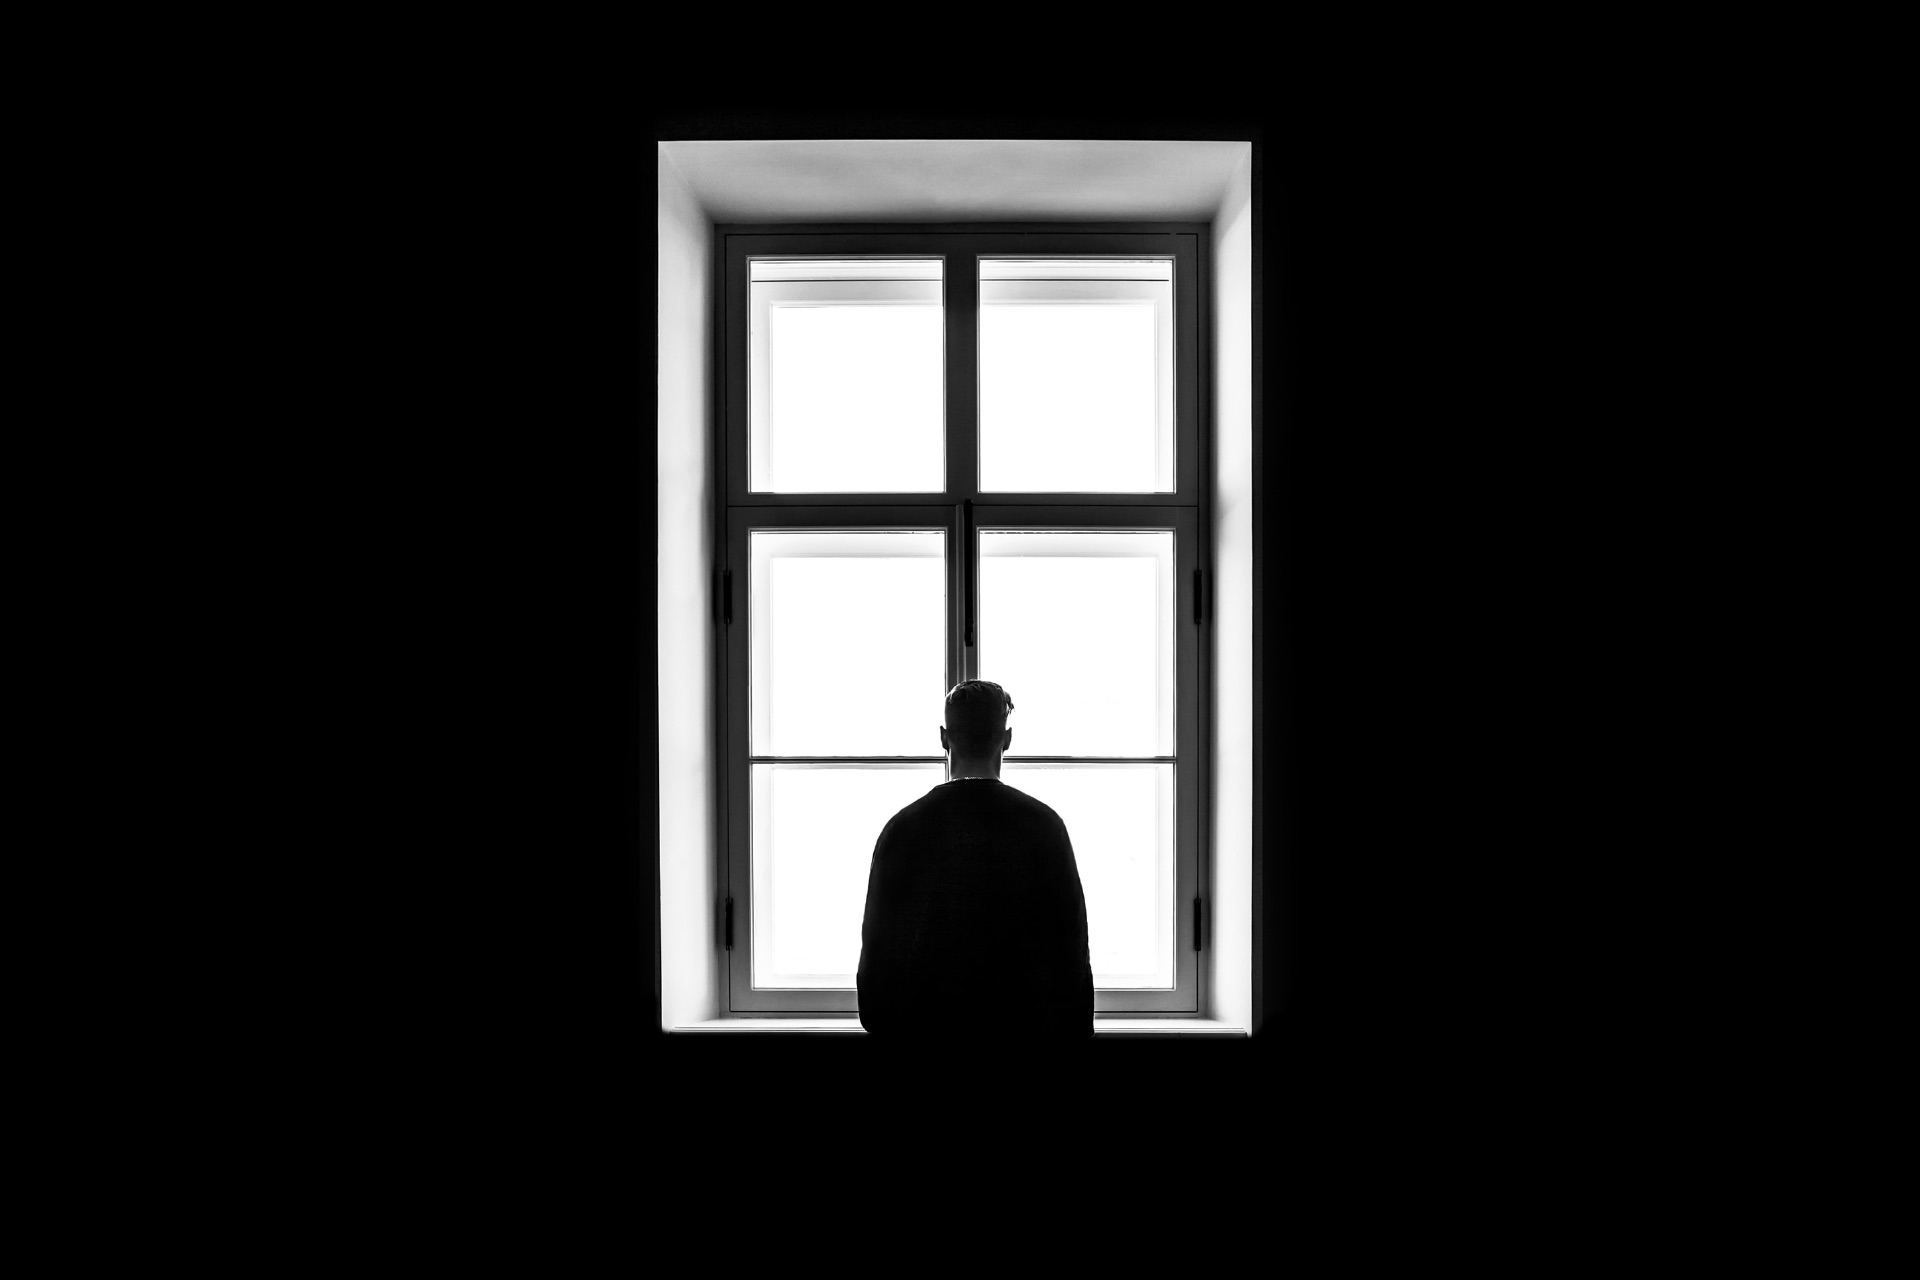 GROW - Somberheid / Depressie (2)